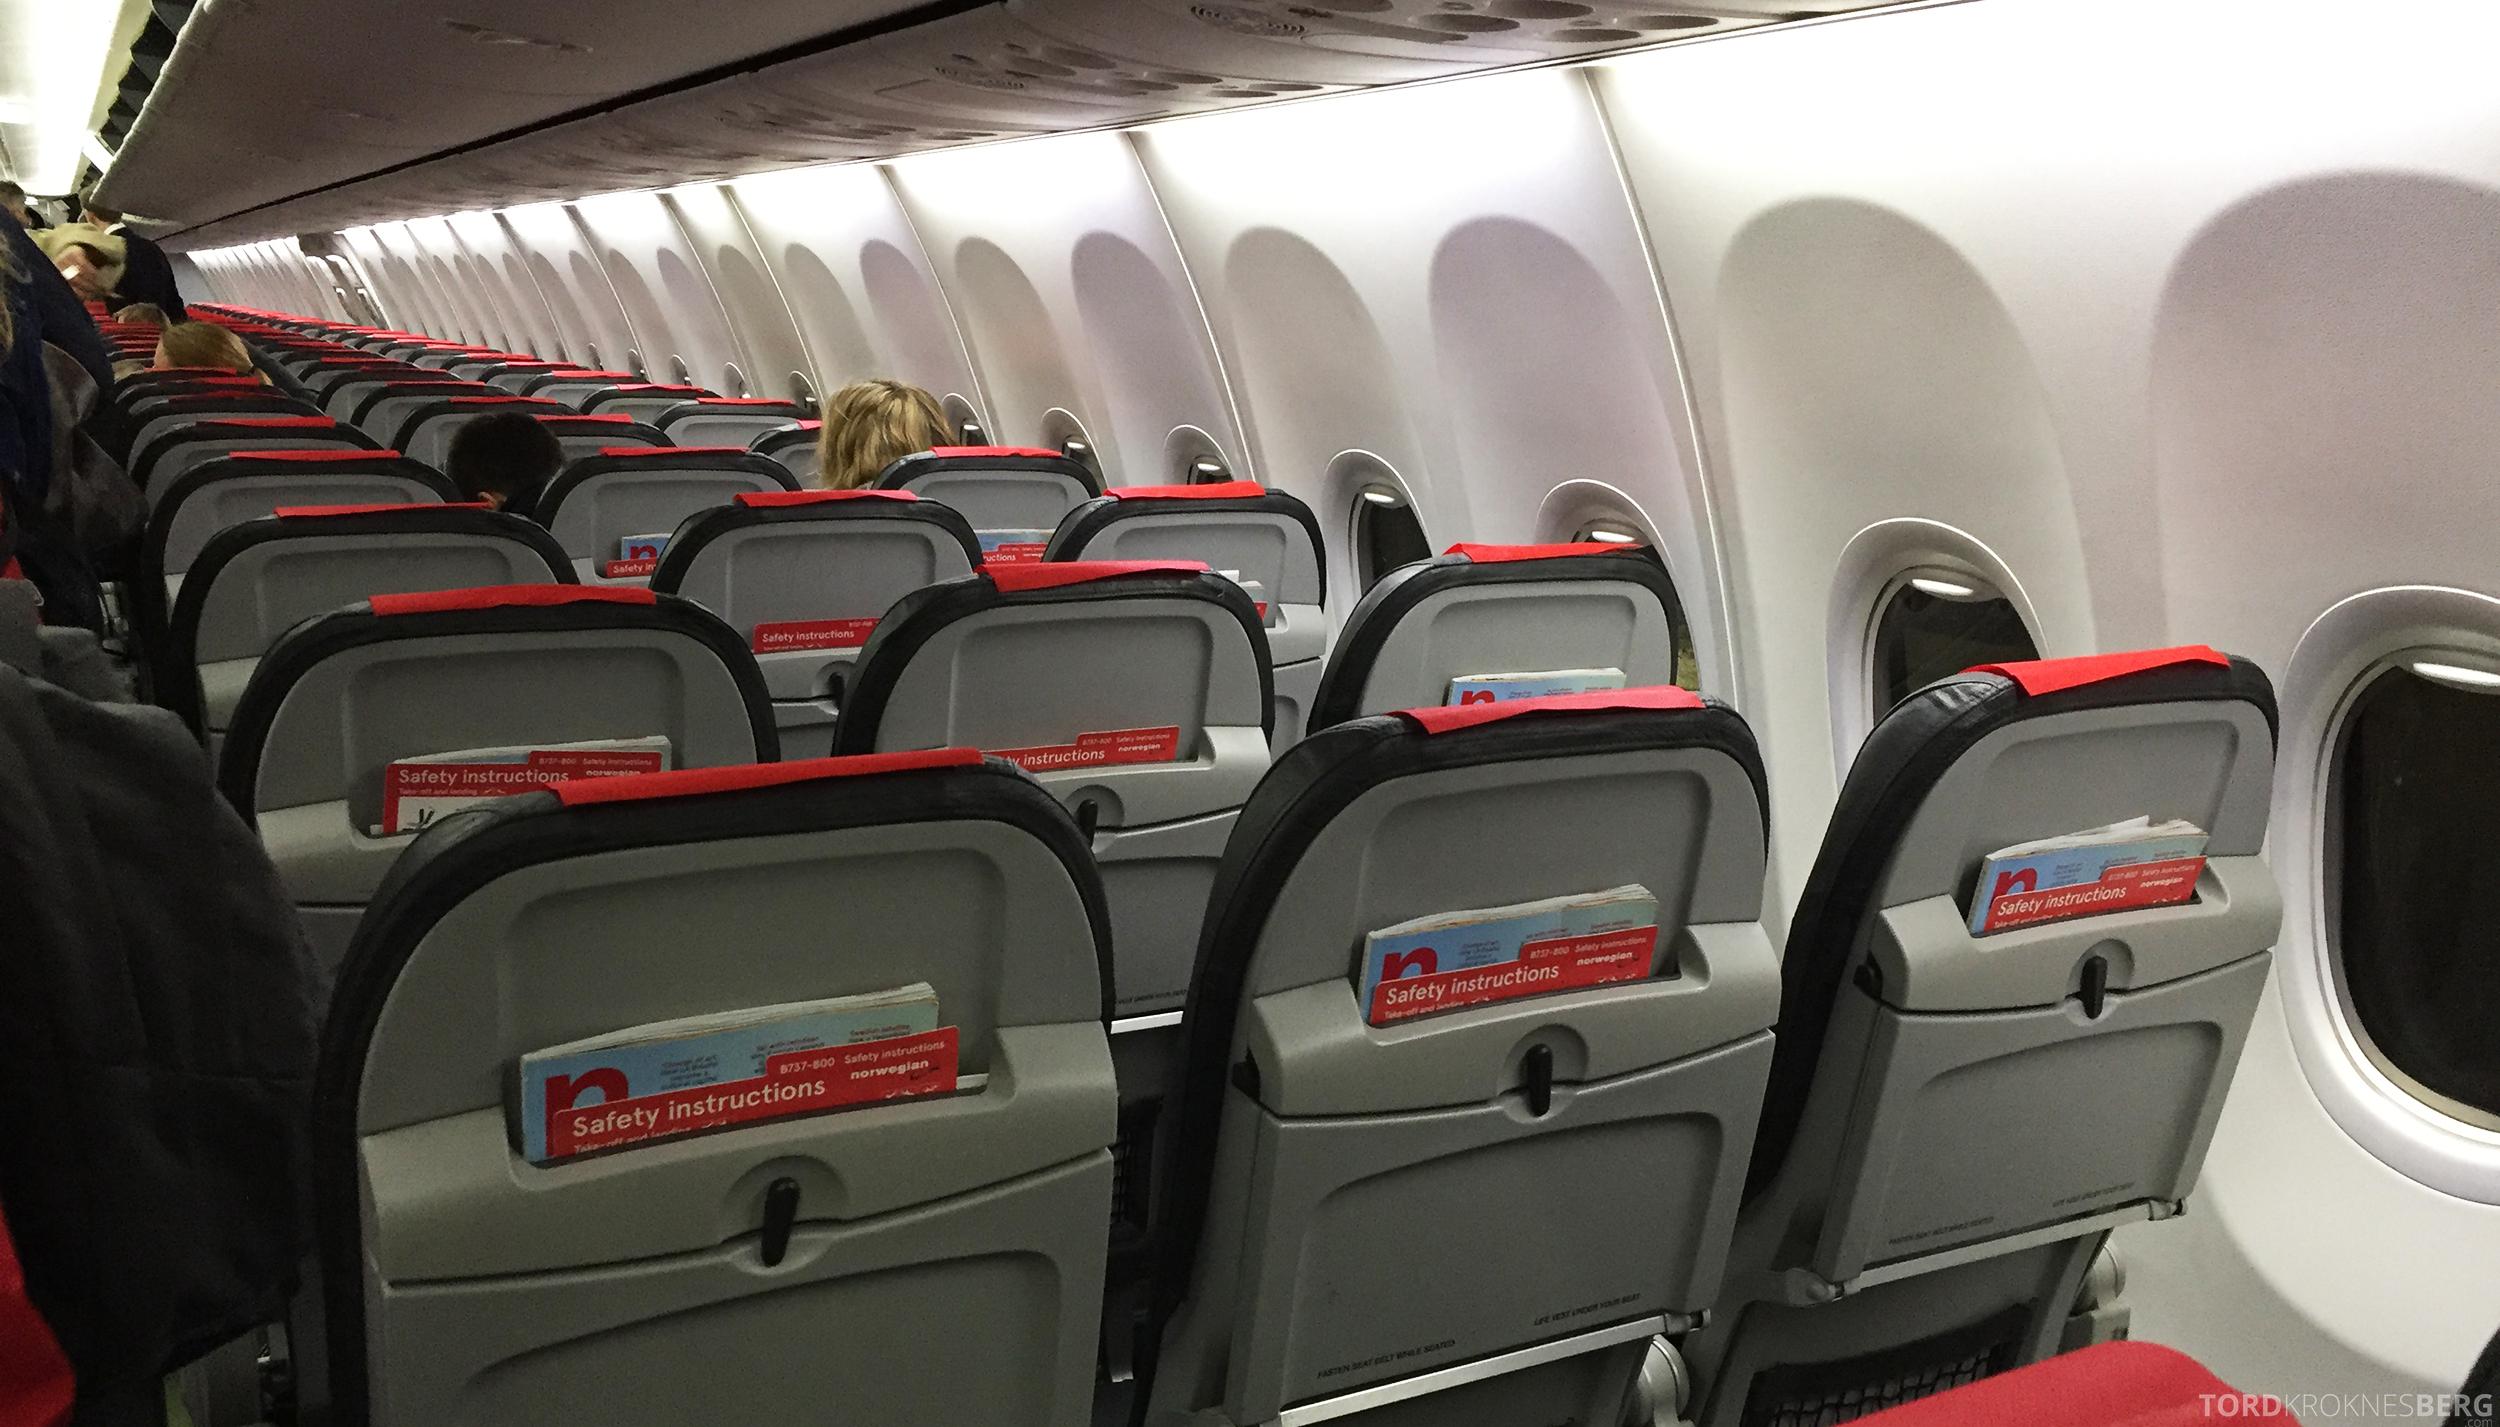 Norwegian Charter Trondheim Las Palmas ombord